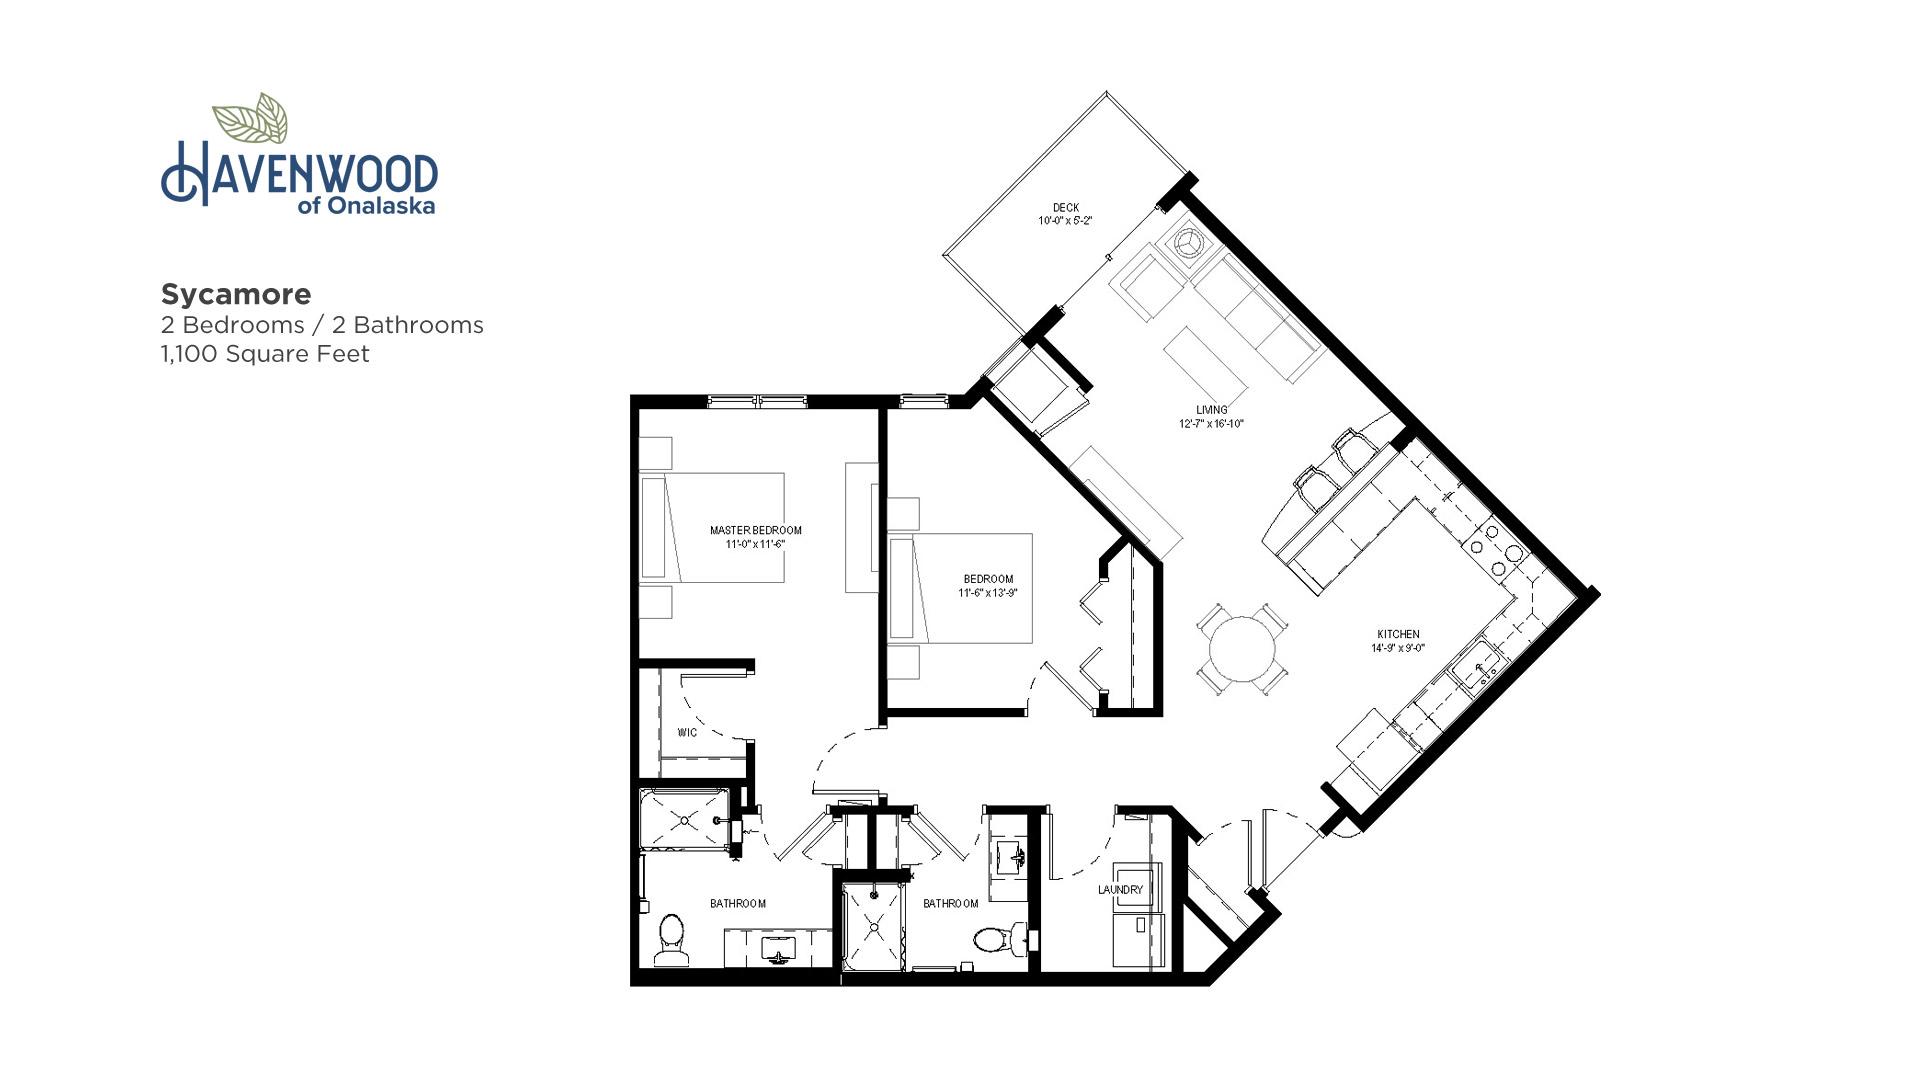 Havenwood of Onalaska Sycamore Floor Plan